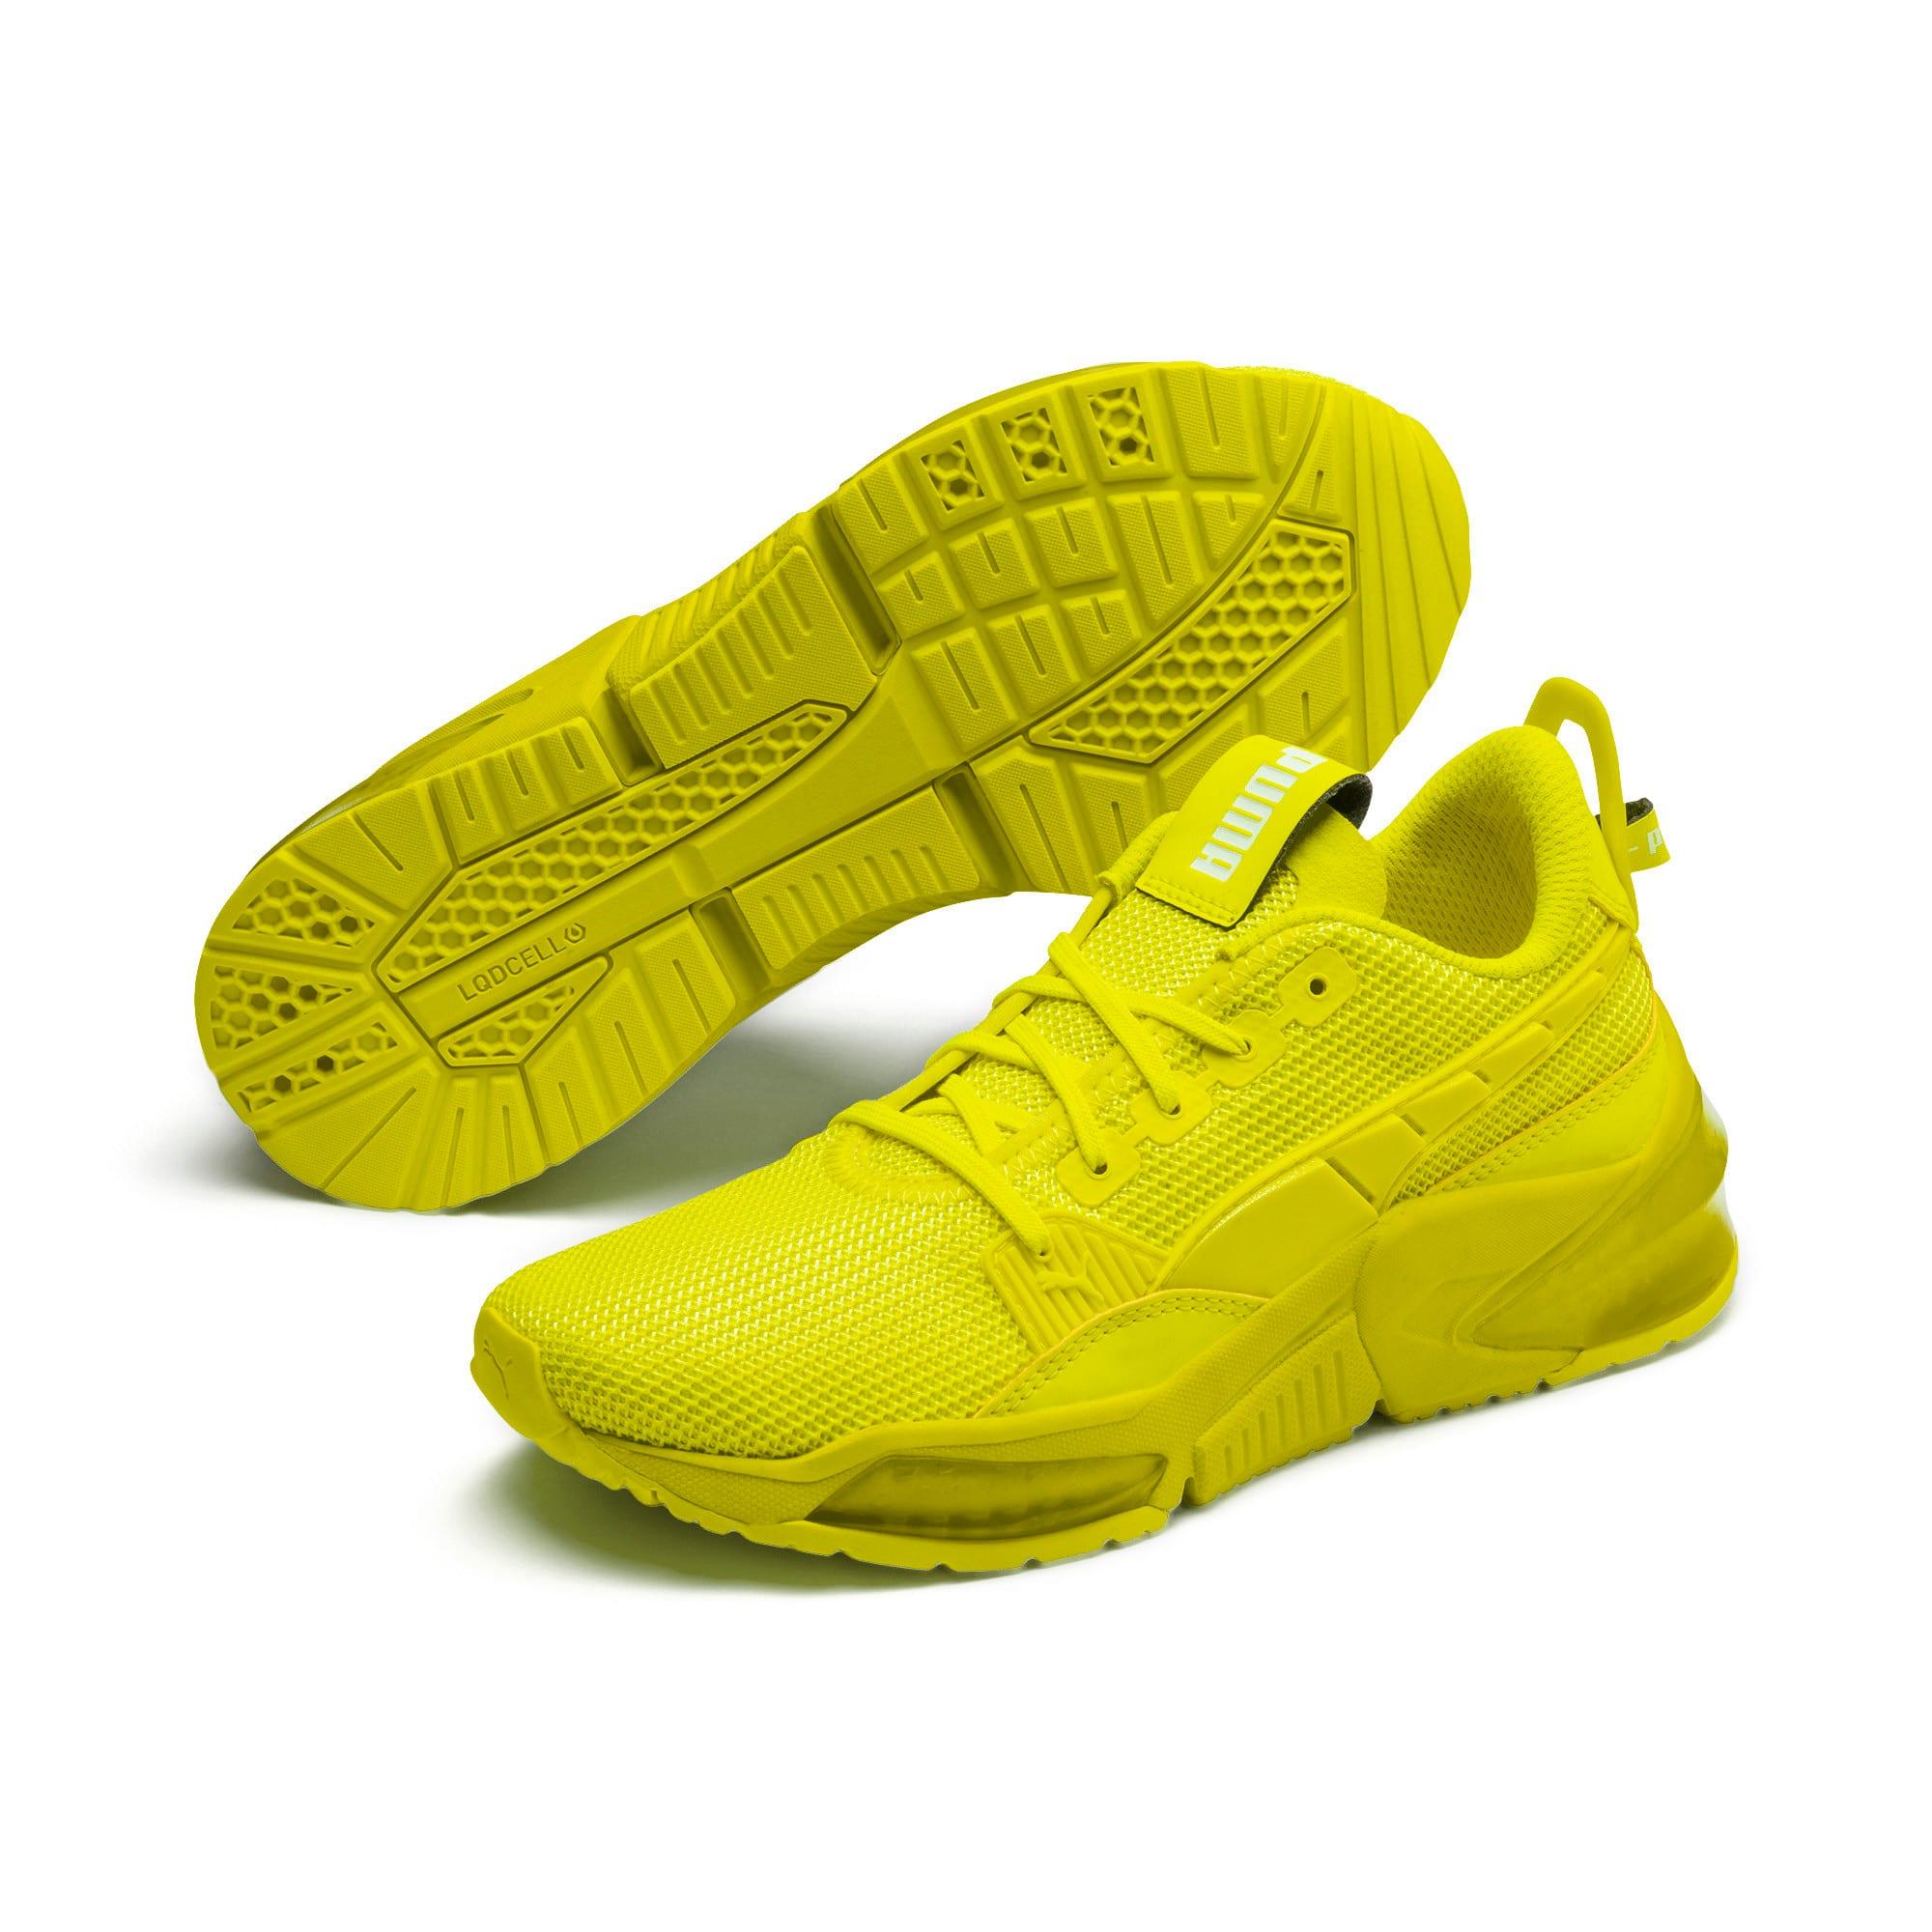 Thumbnail 2 of LQDCELL Optic Sci-Fi Women's Training Shoes, Yellow Alert, medium